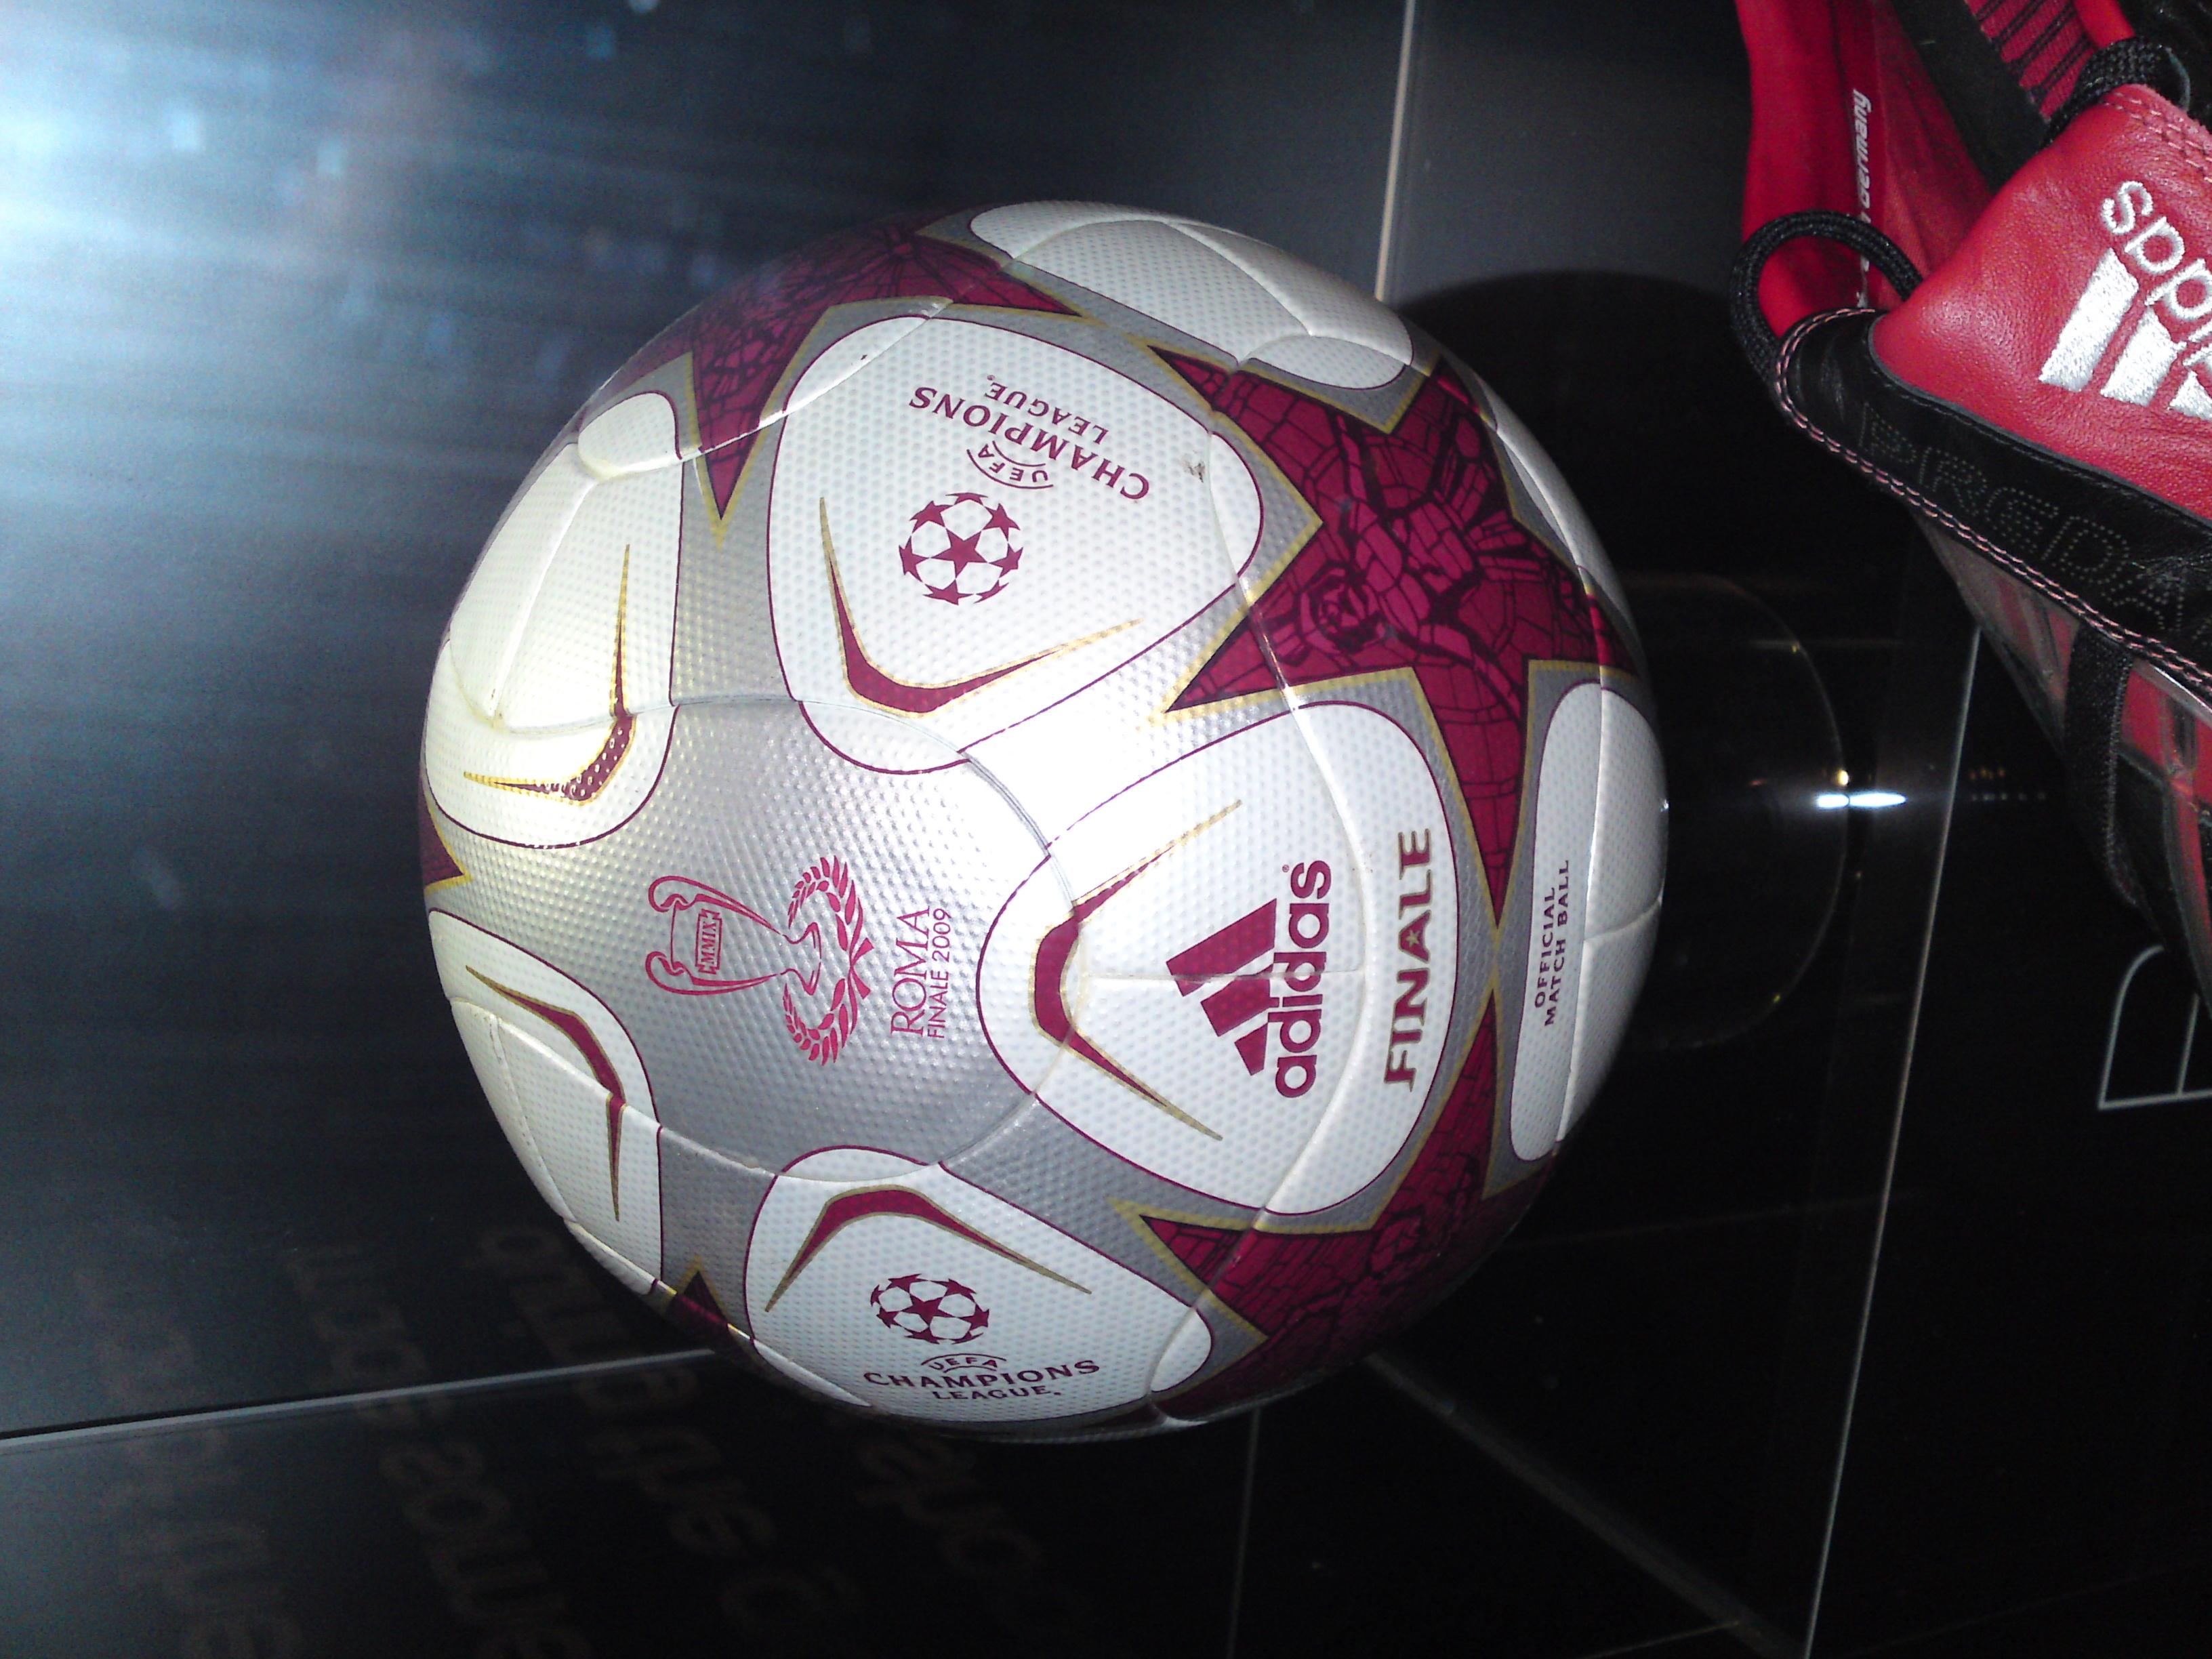 file 2009 uefa champions league final ball jpg wikimedia commons https commons wikimedia org wiki file 2009 uefa champions league final ball jpg